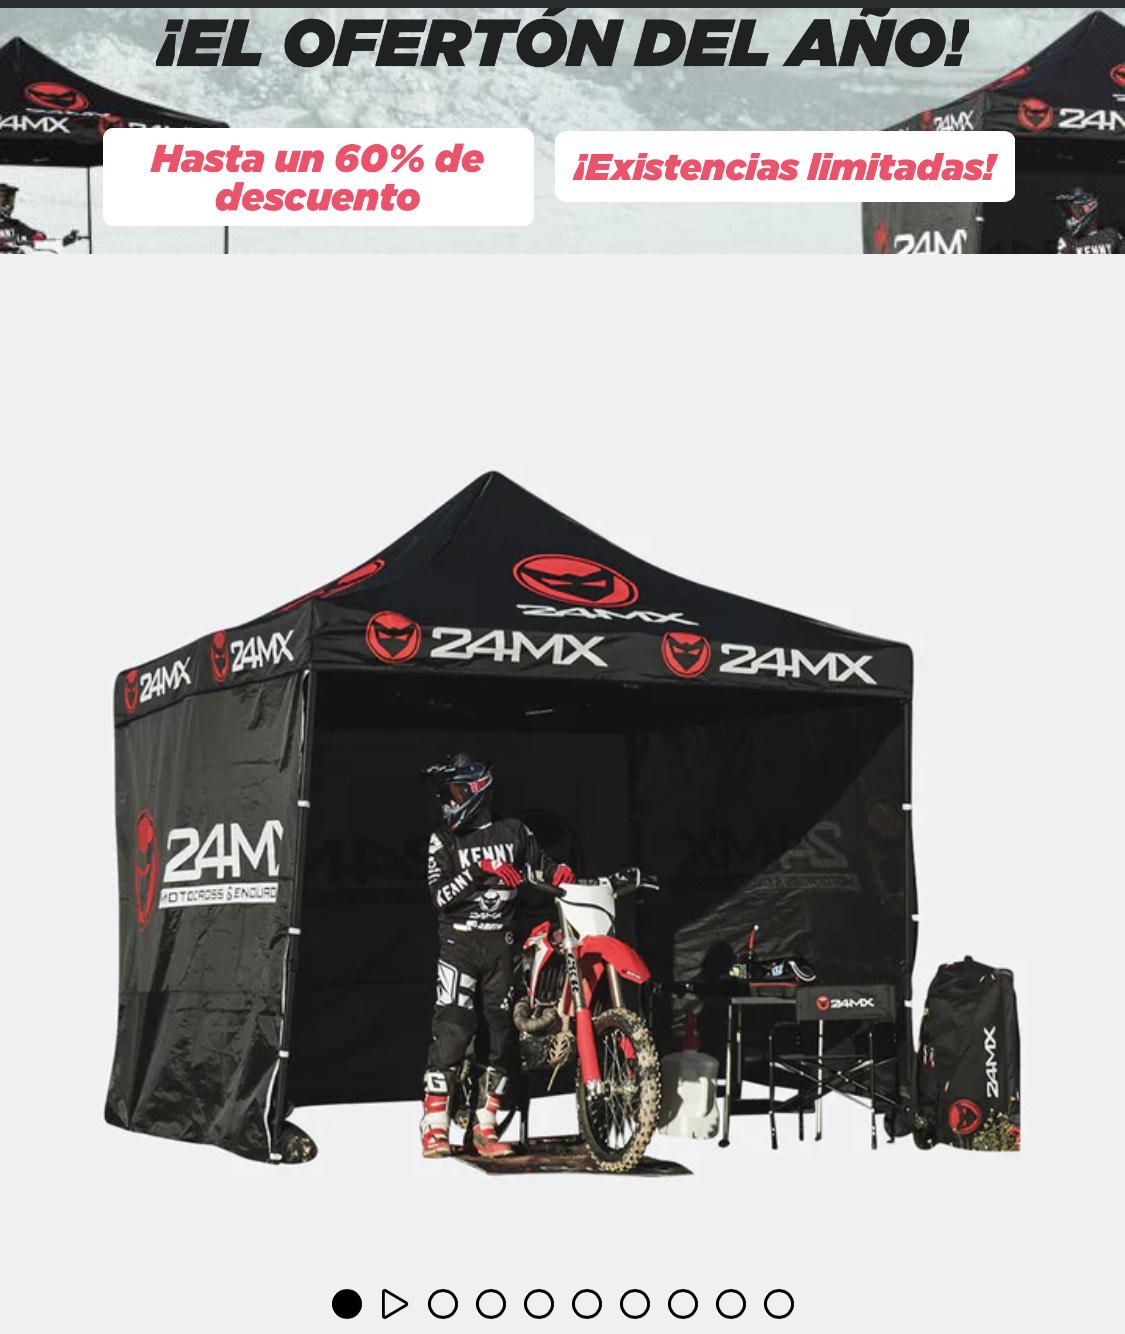 Carpa 24MX Race Easy-Up